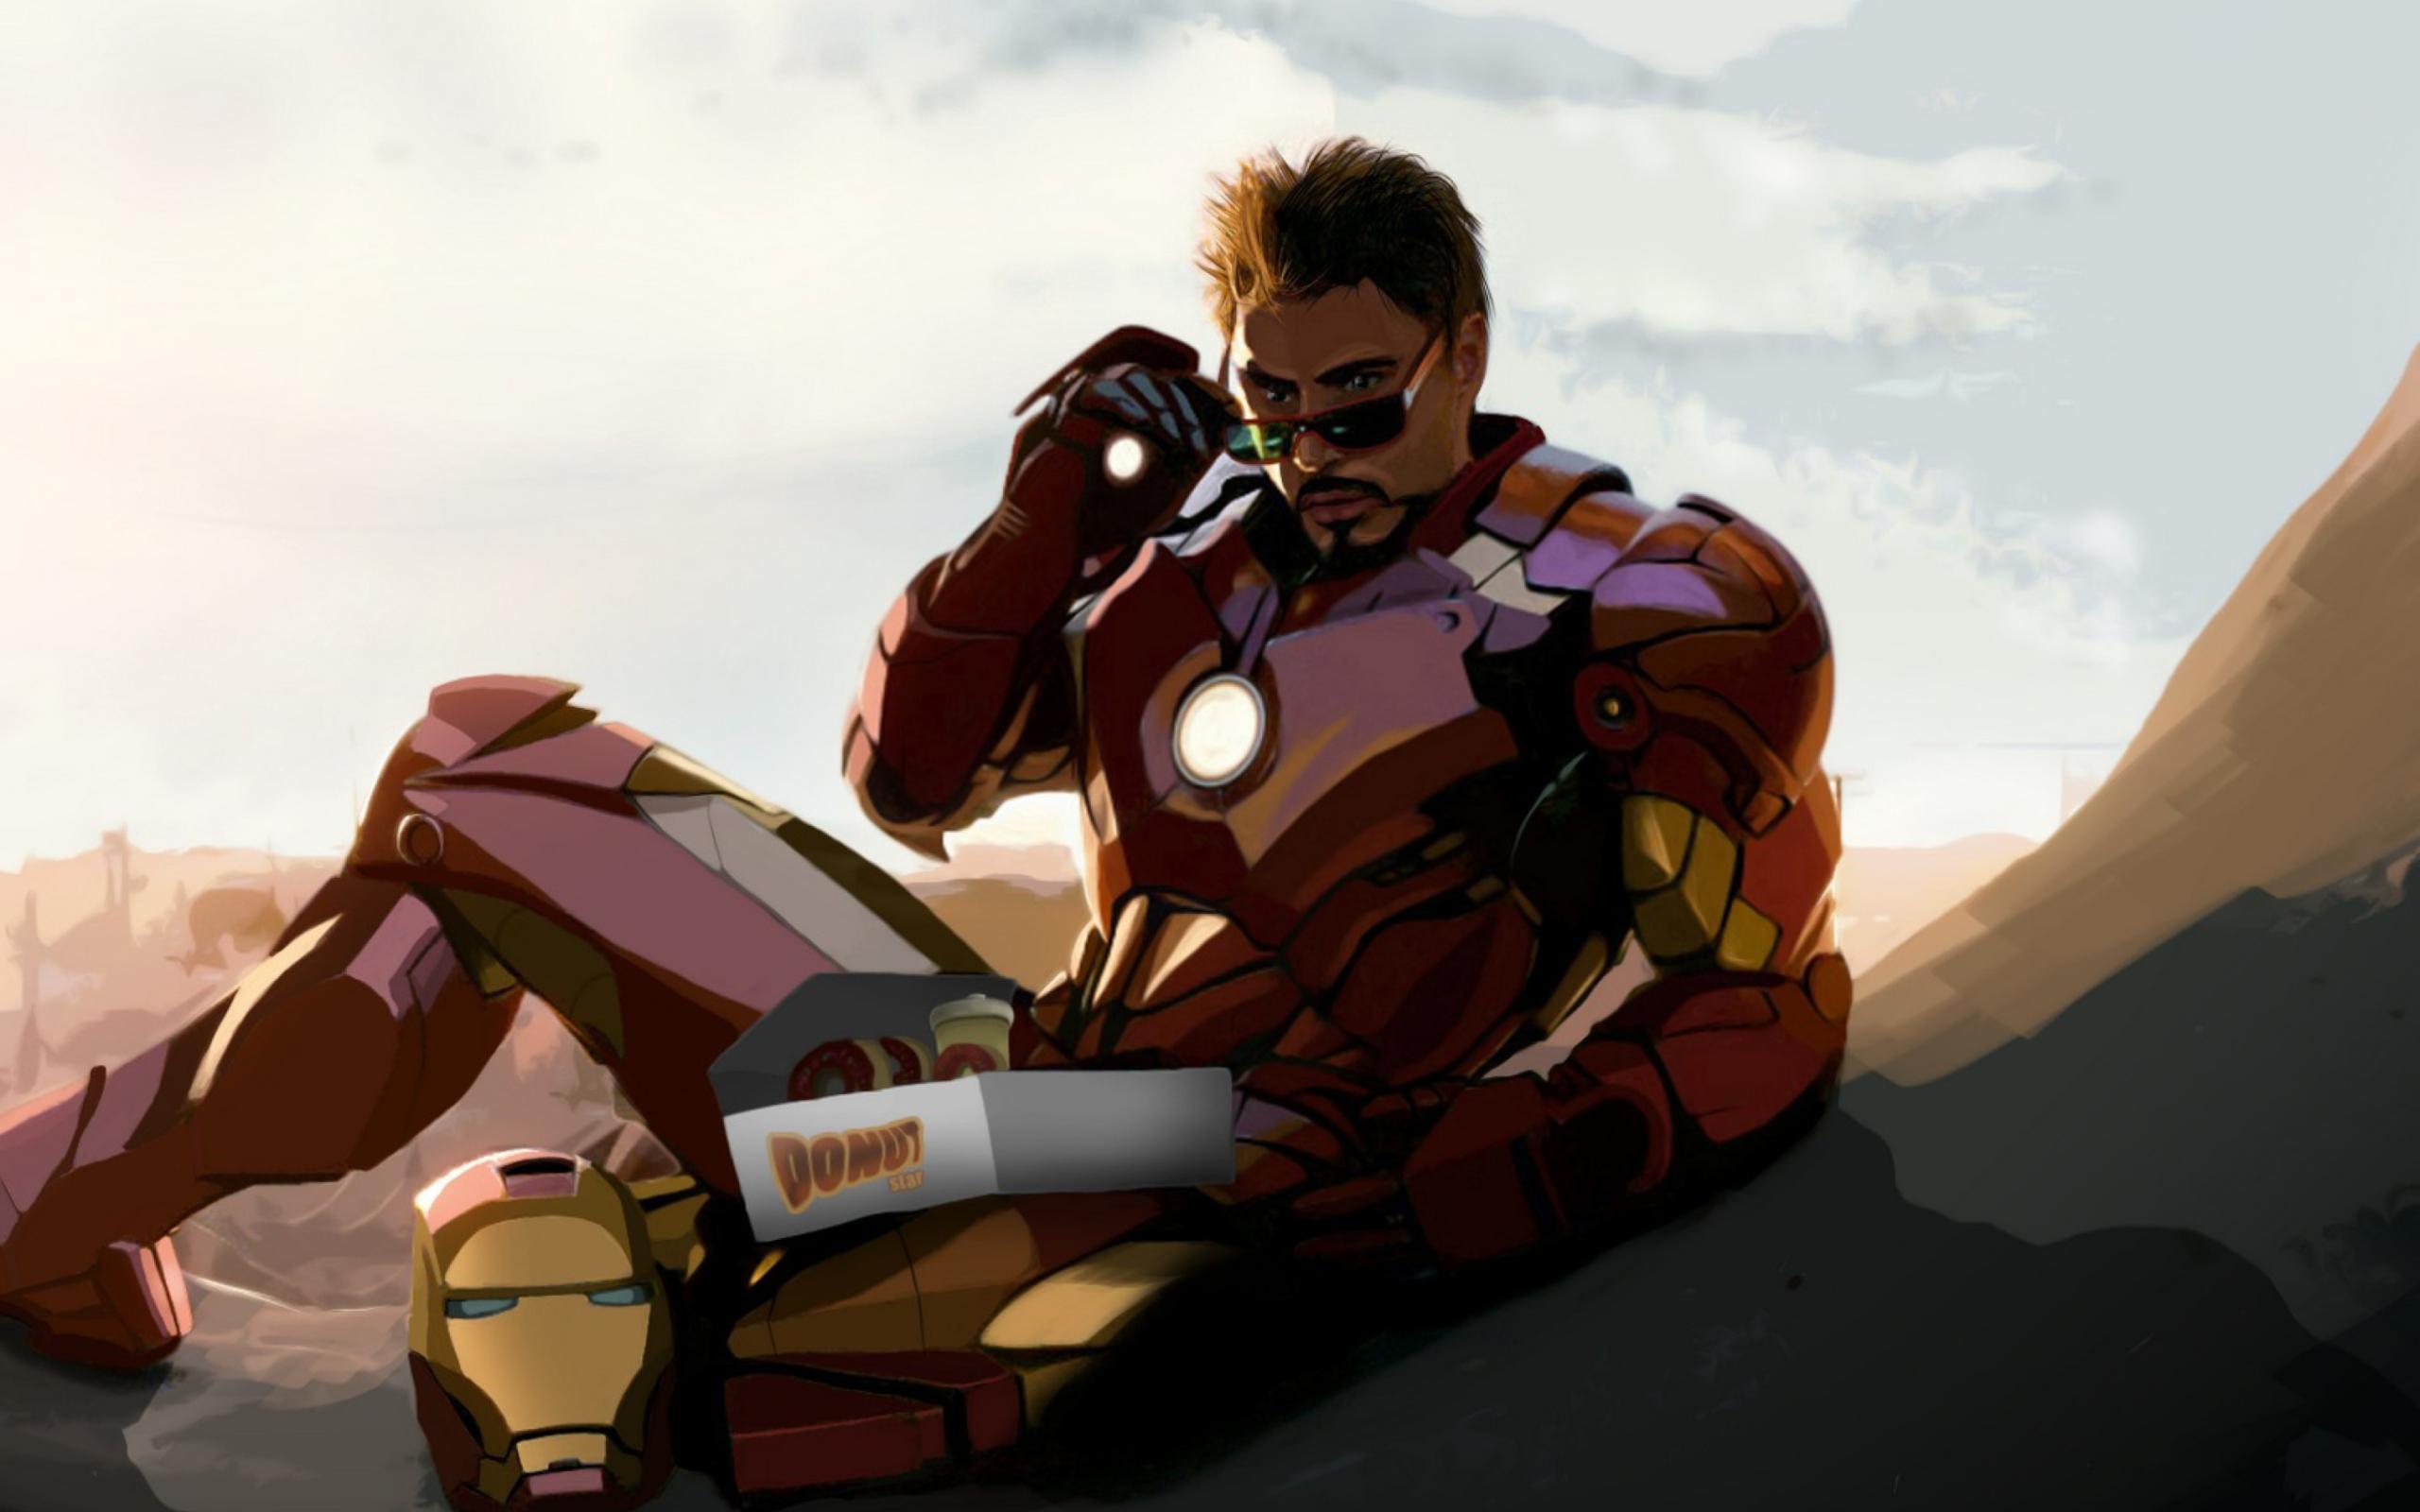 Tony stark iron man fondos de pantalla gratis para 2560x1600 - Fondos de pantalla de iron man en 3d ...